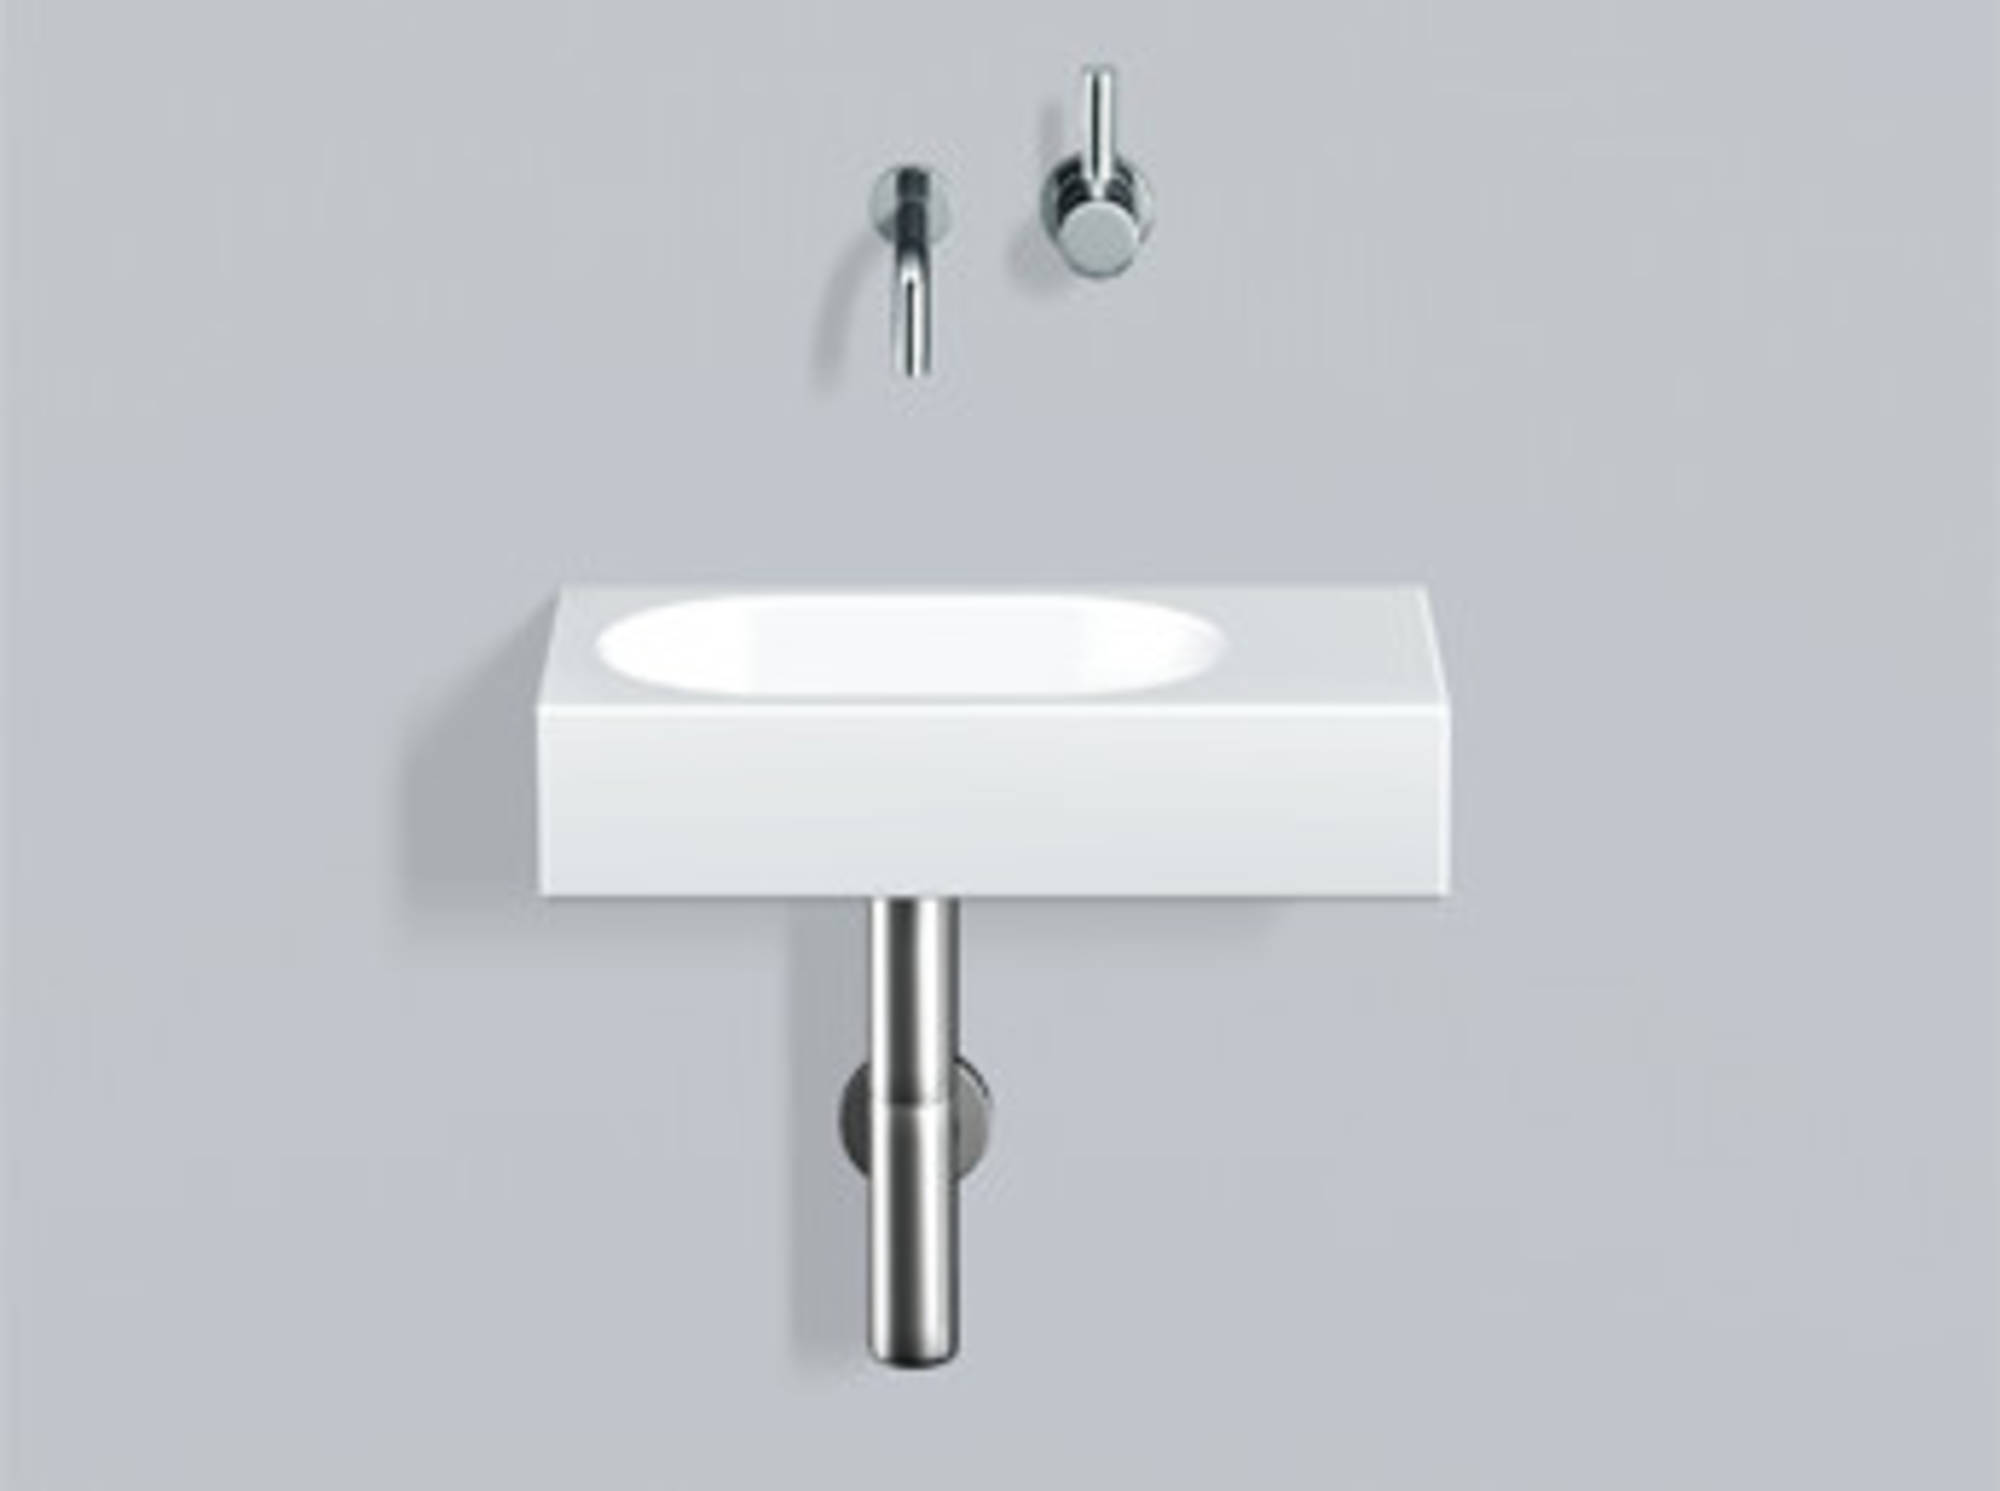 Mini Fontein Toilet : Fontein toilet wc fonteinen bouwbestel